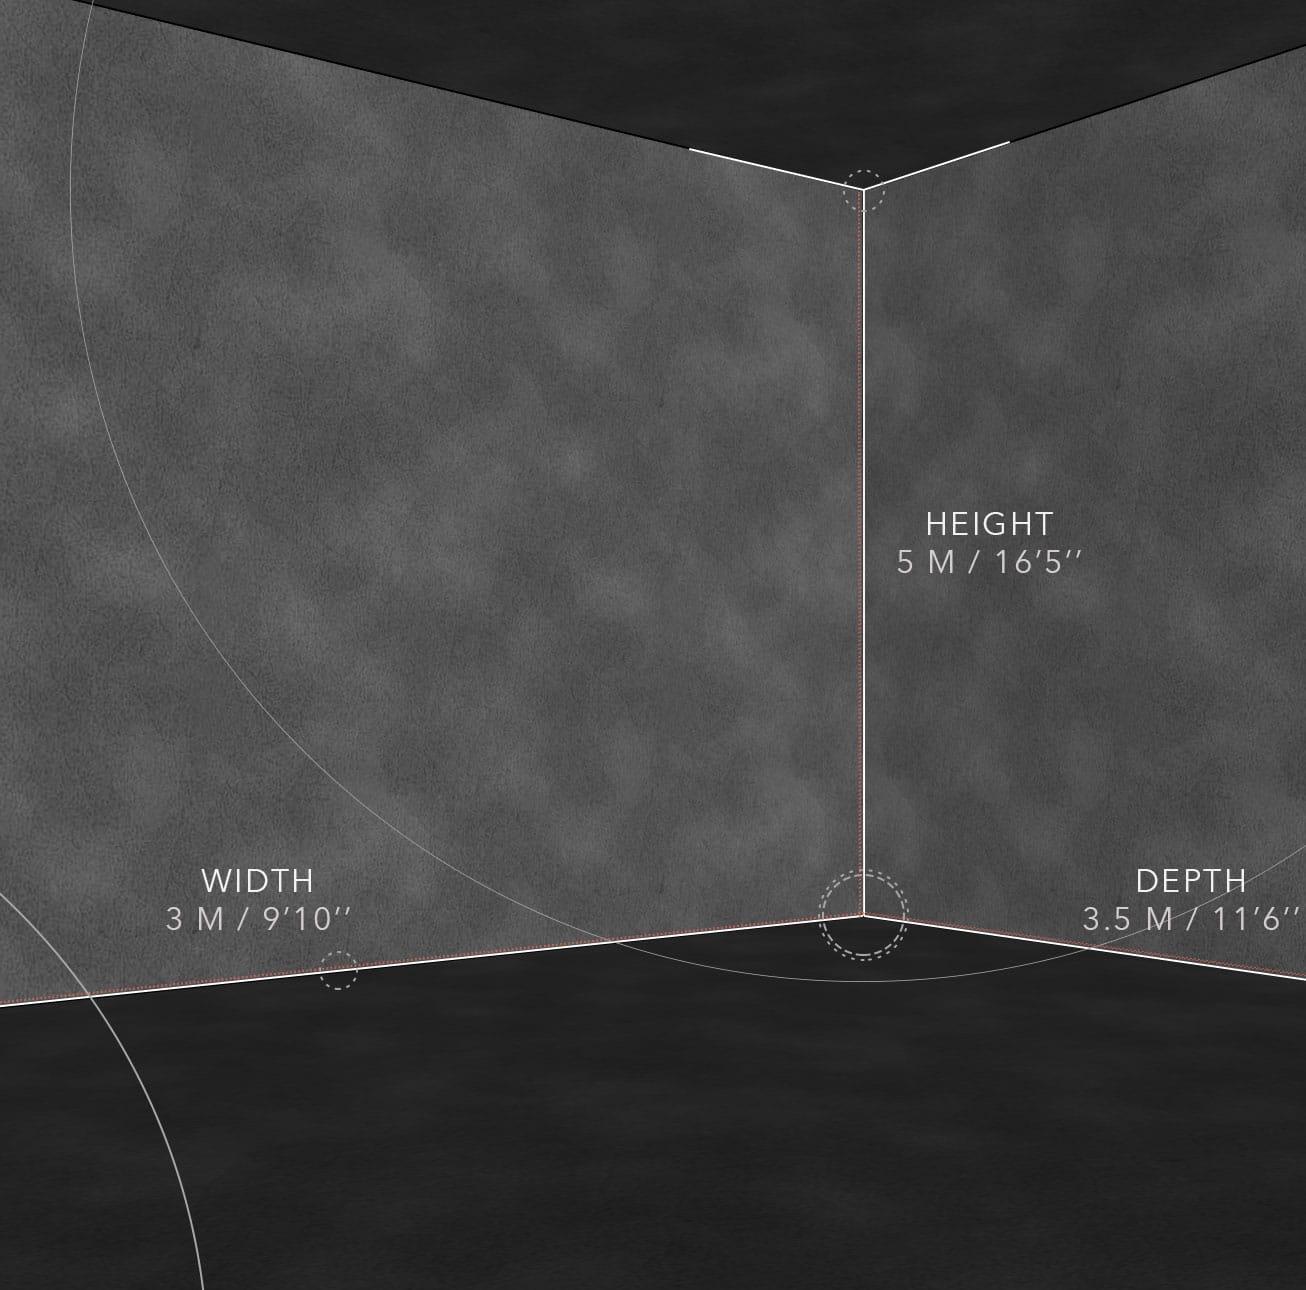 Shooting Simulator ST-2 Dimensions-DRIVEN